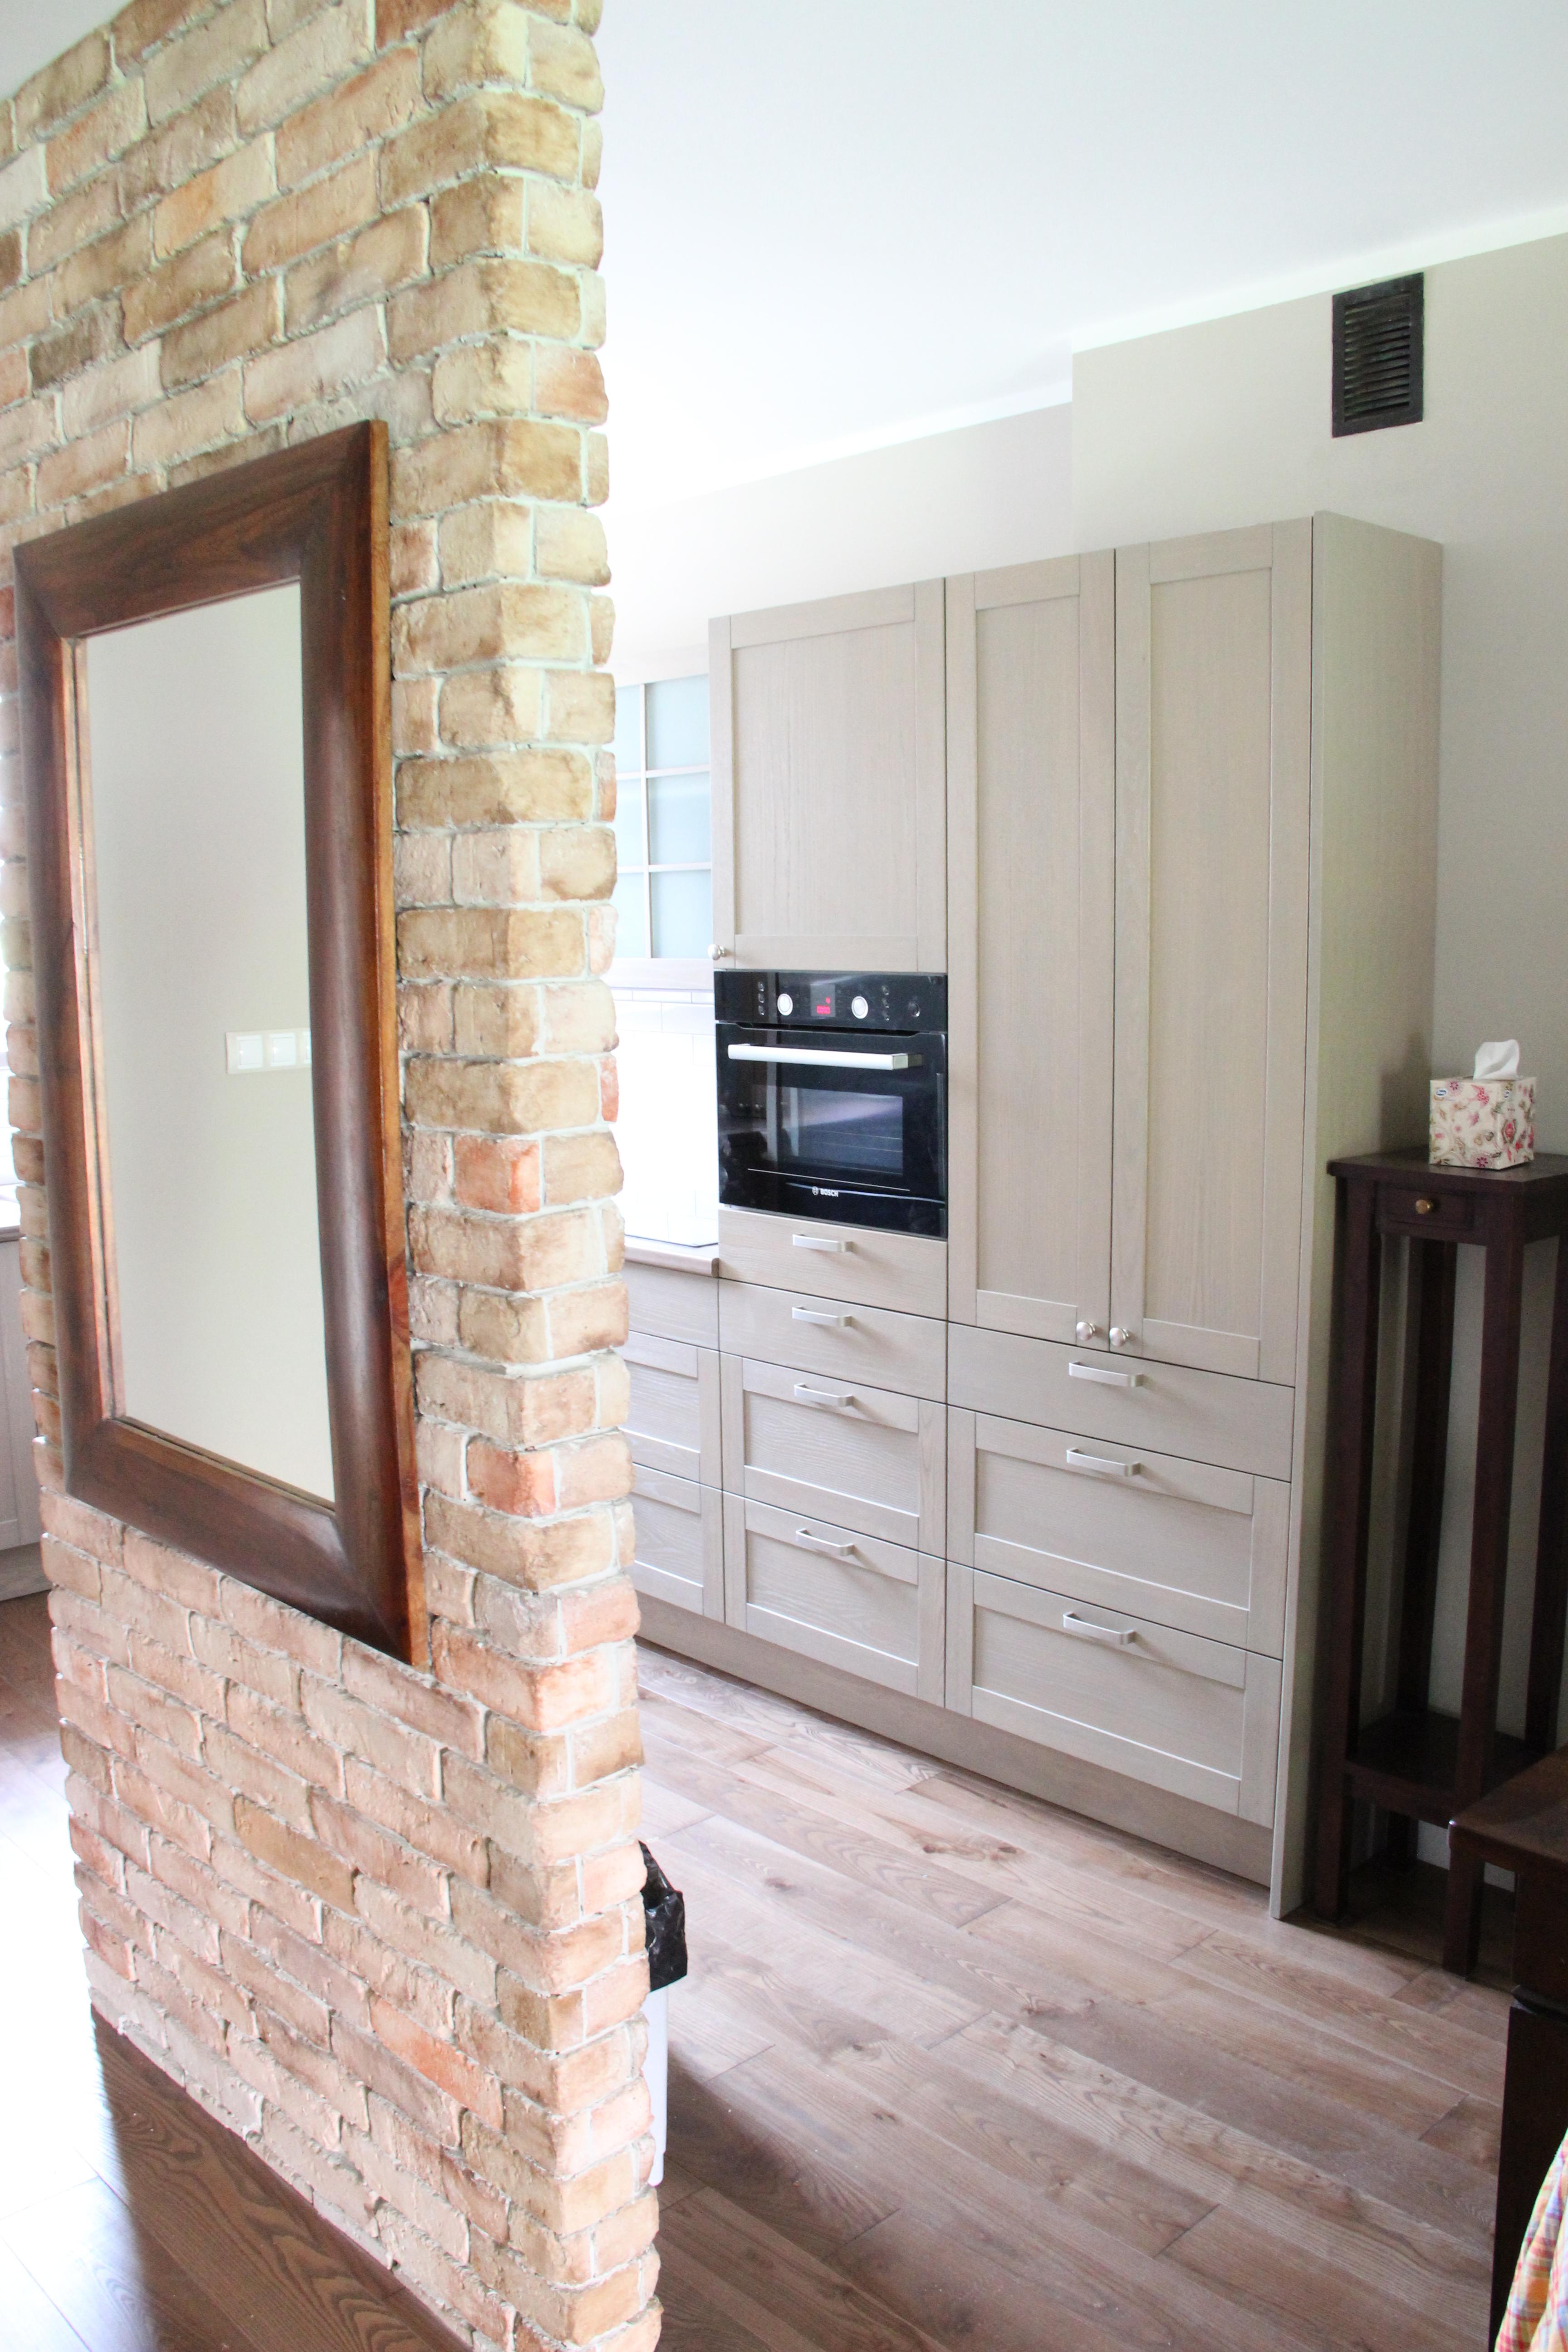 meble kuchenne micha kaczanowski szczecin zachodniopomorskie. Black Bedroom Furniture Sets. Home Design Ideas